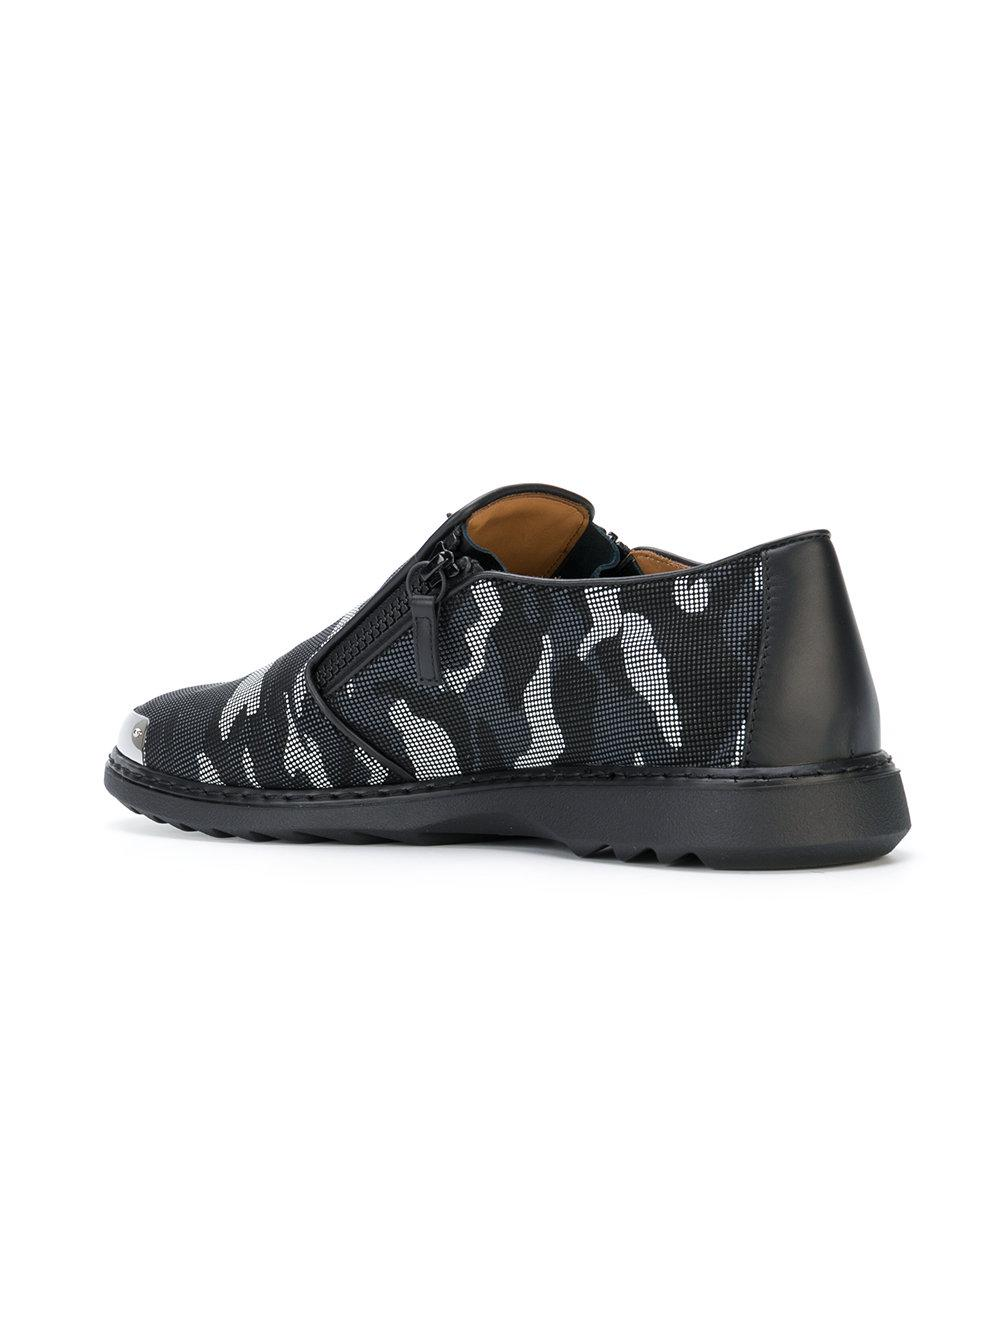 Giuseppe ZanottiCamouflage Cooper sneakers 1uHcfX